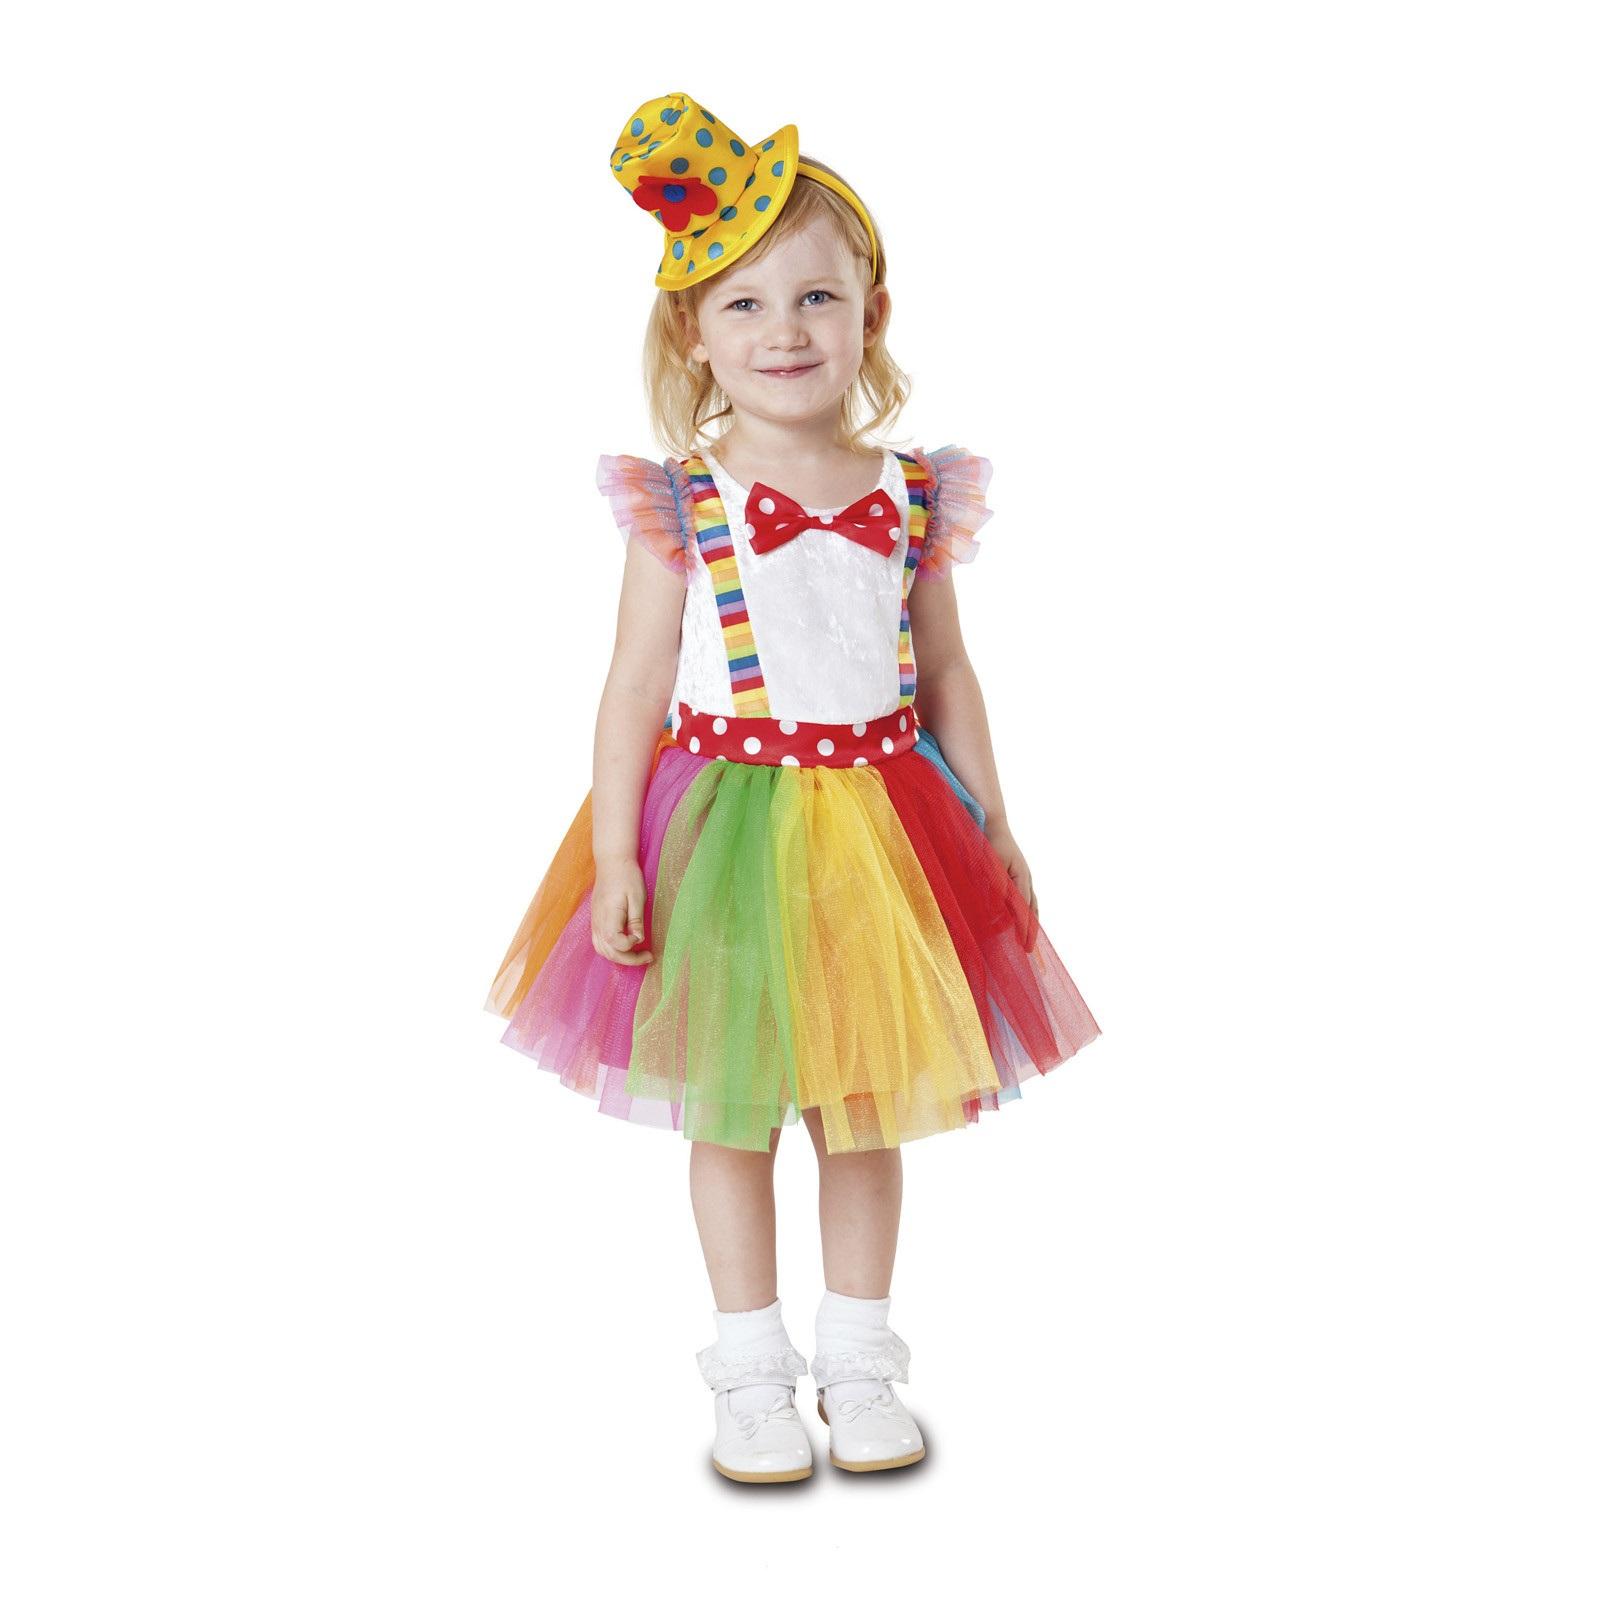 disfraz payasita tutú niña 203199mom - DISFRAZ DE PAYASITA TUTU NIÑA